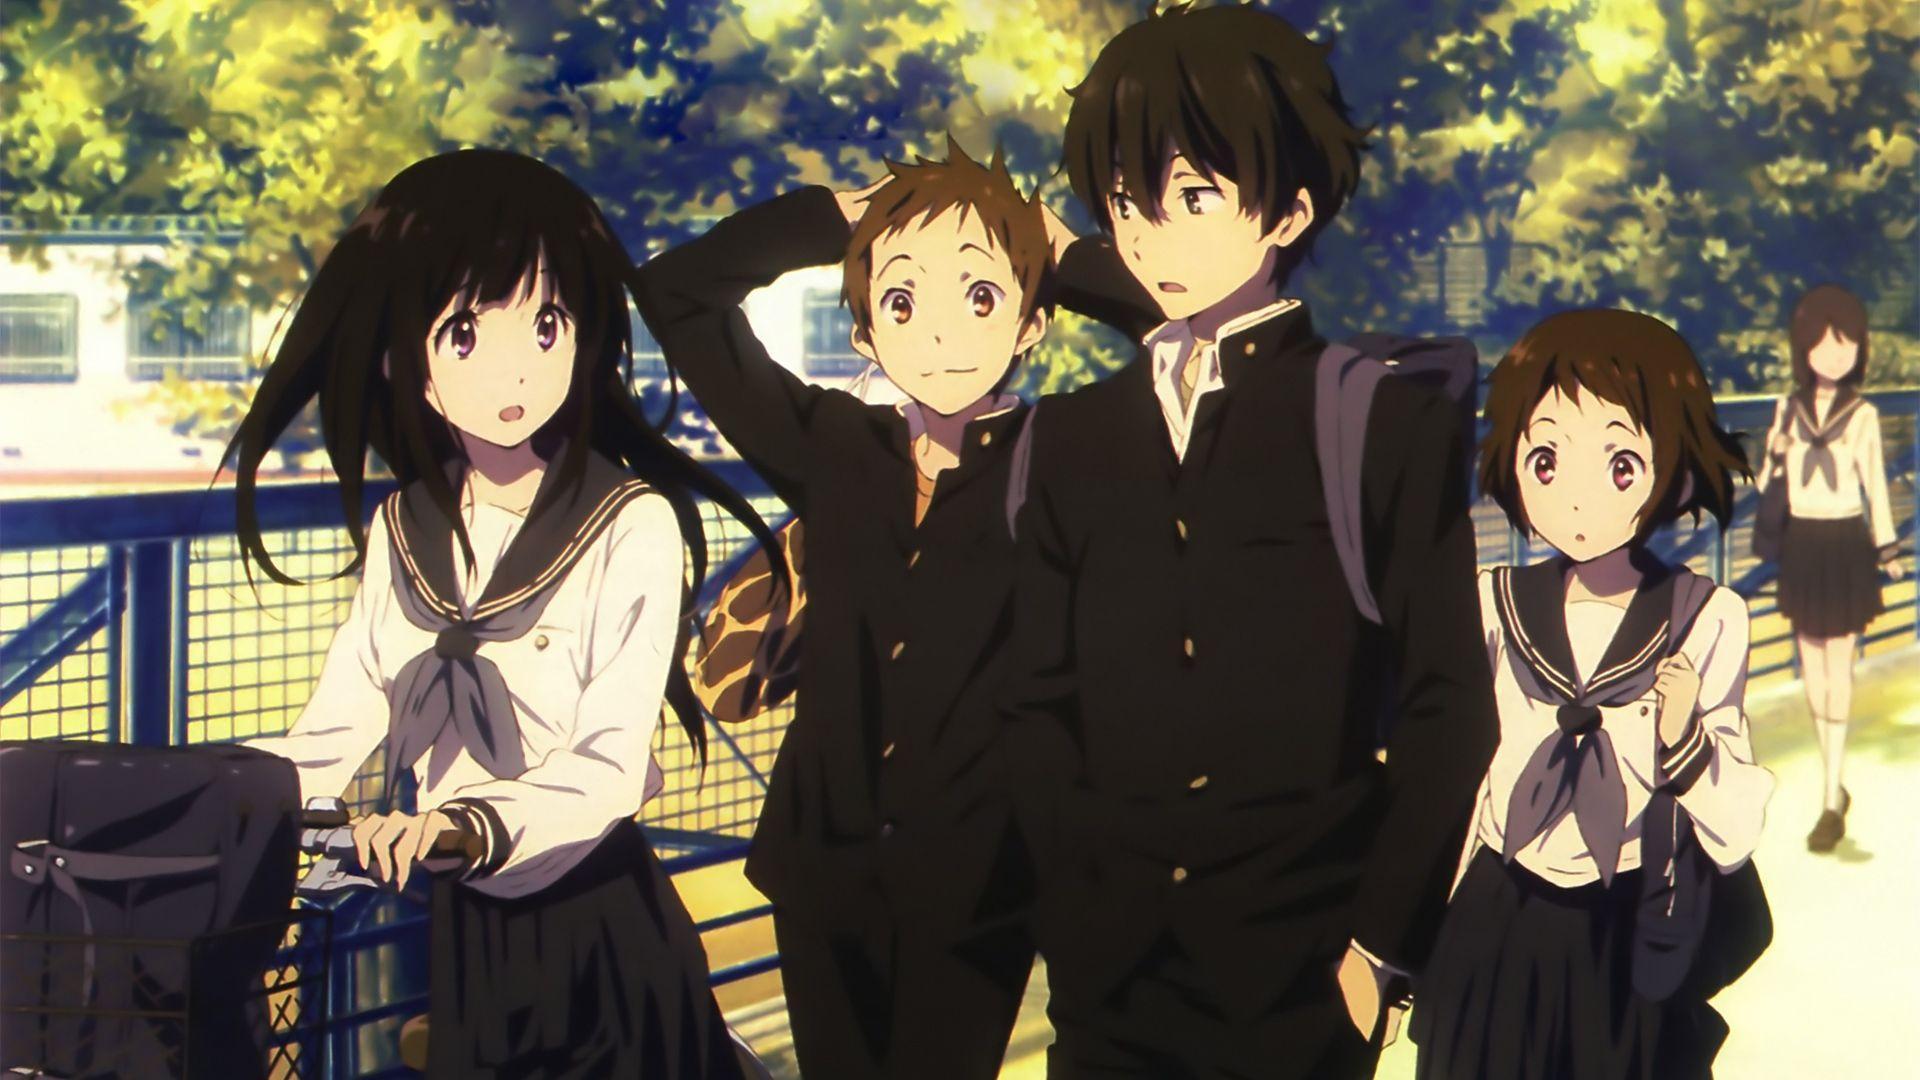 Romantic, high school anime like The Detective Is Already Dead, Hyouka